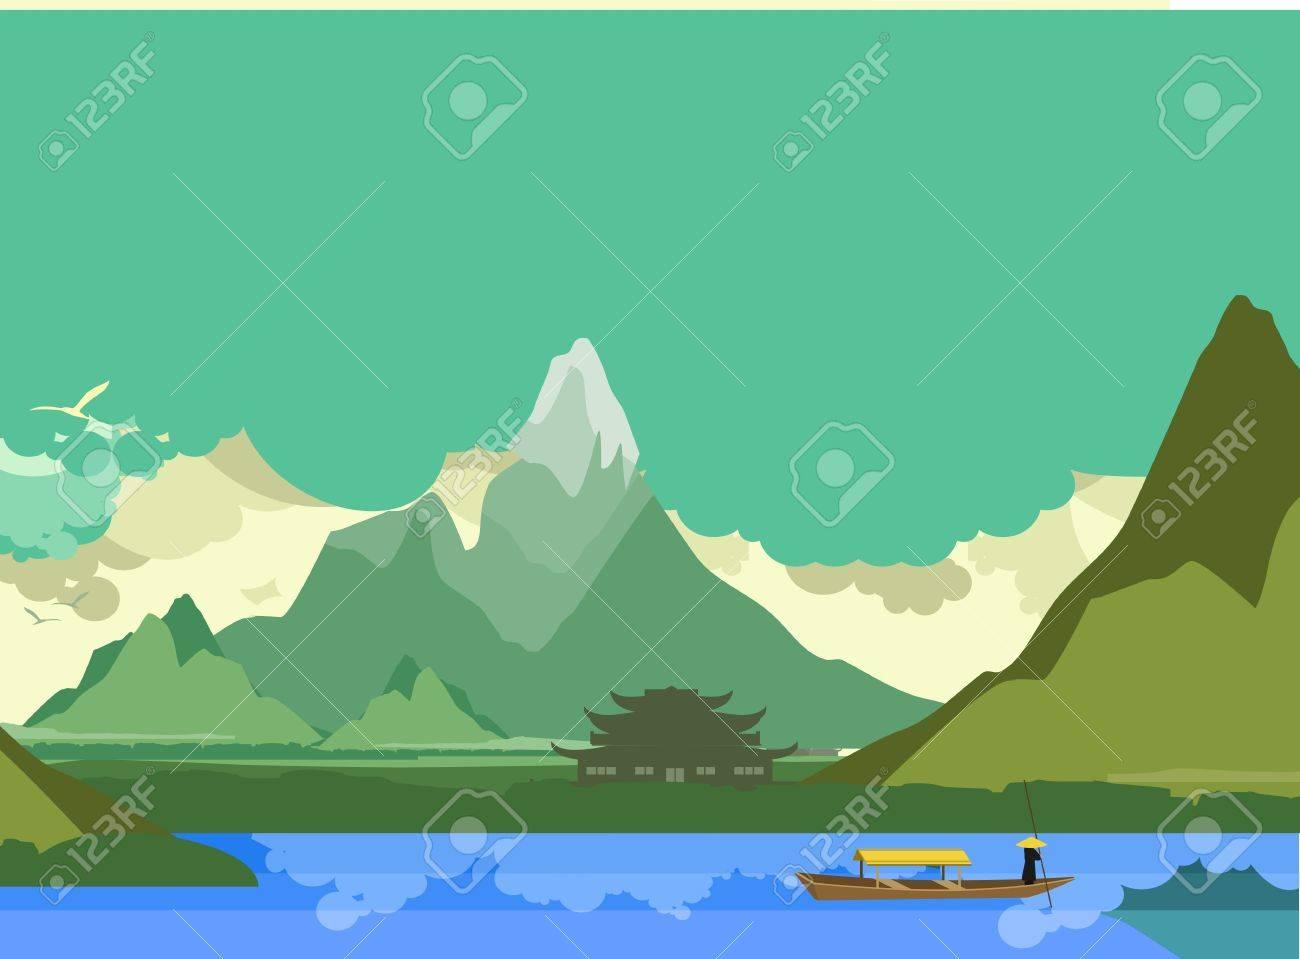 Clipart highlands